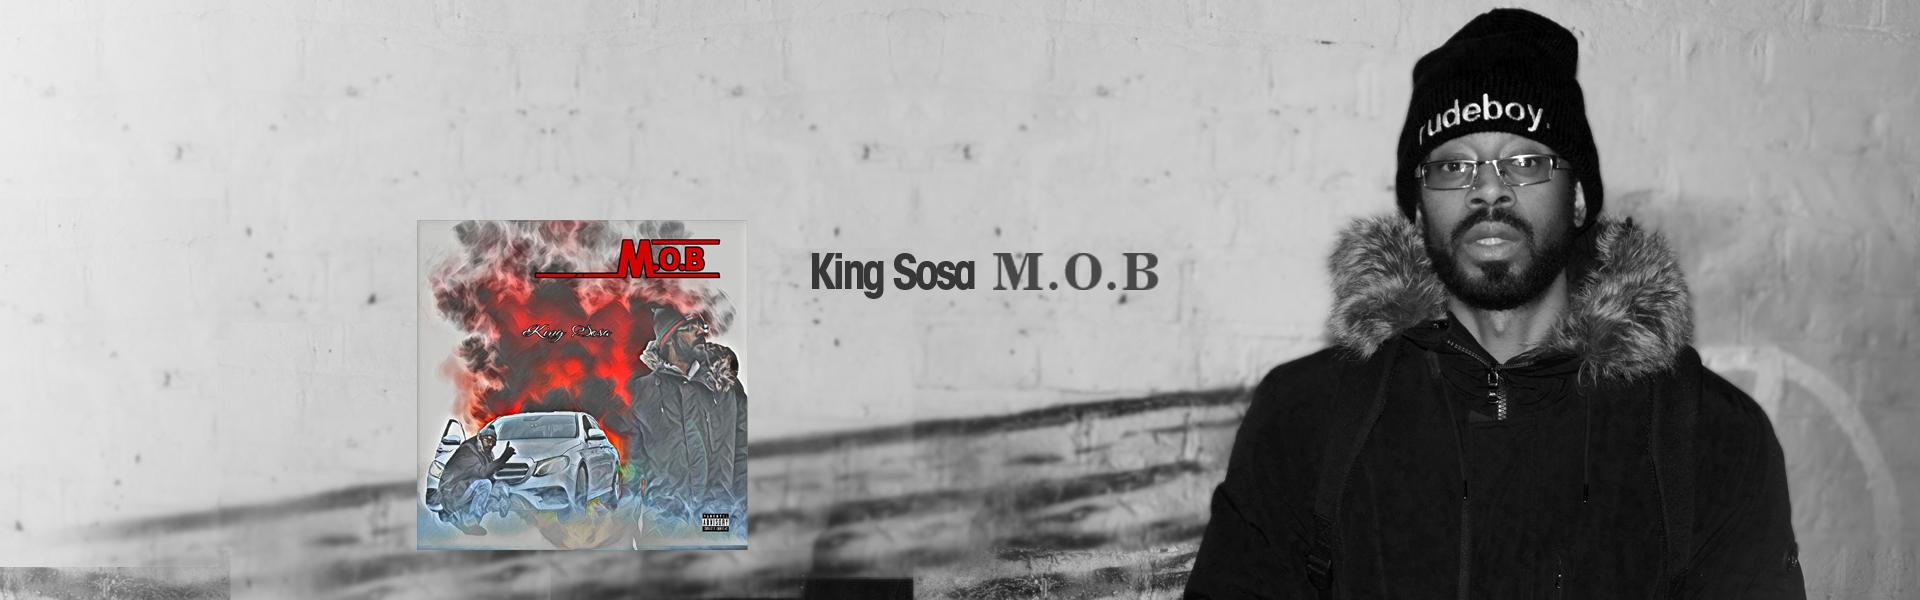 m.o.b by king sosa